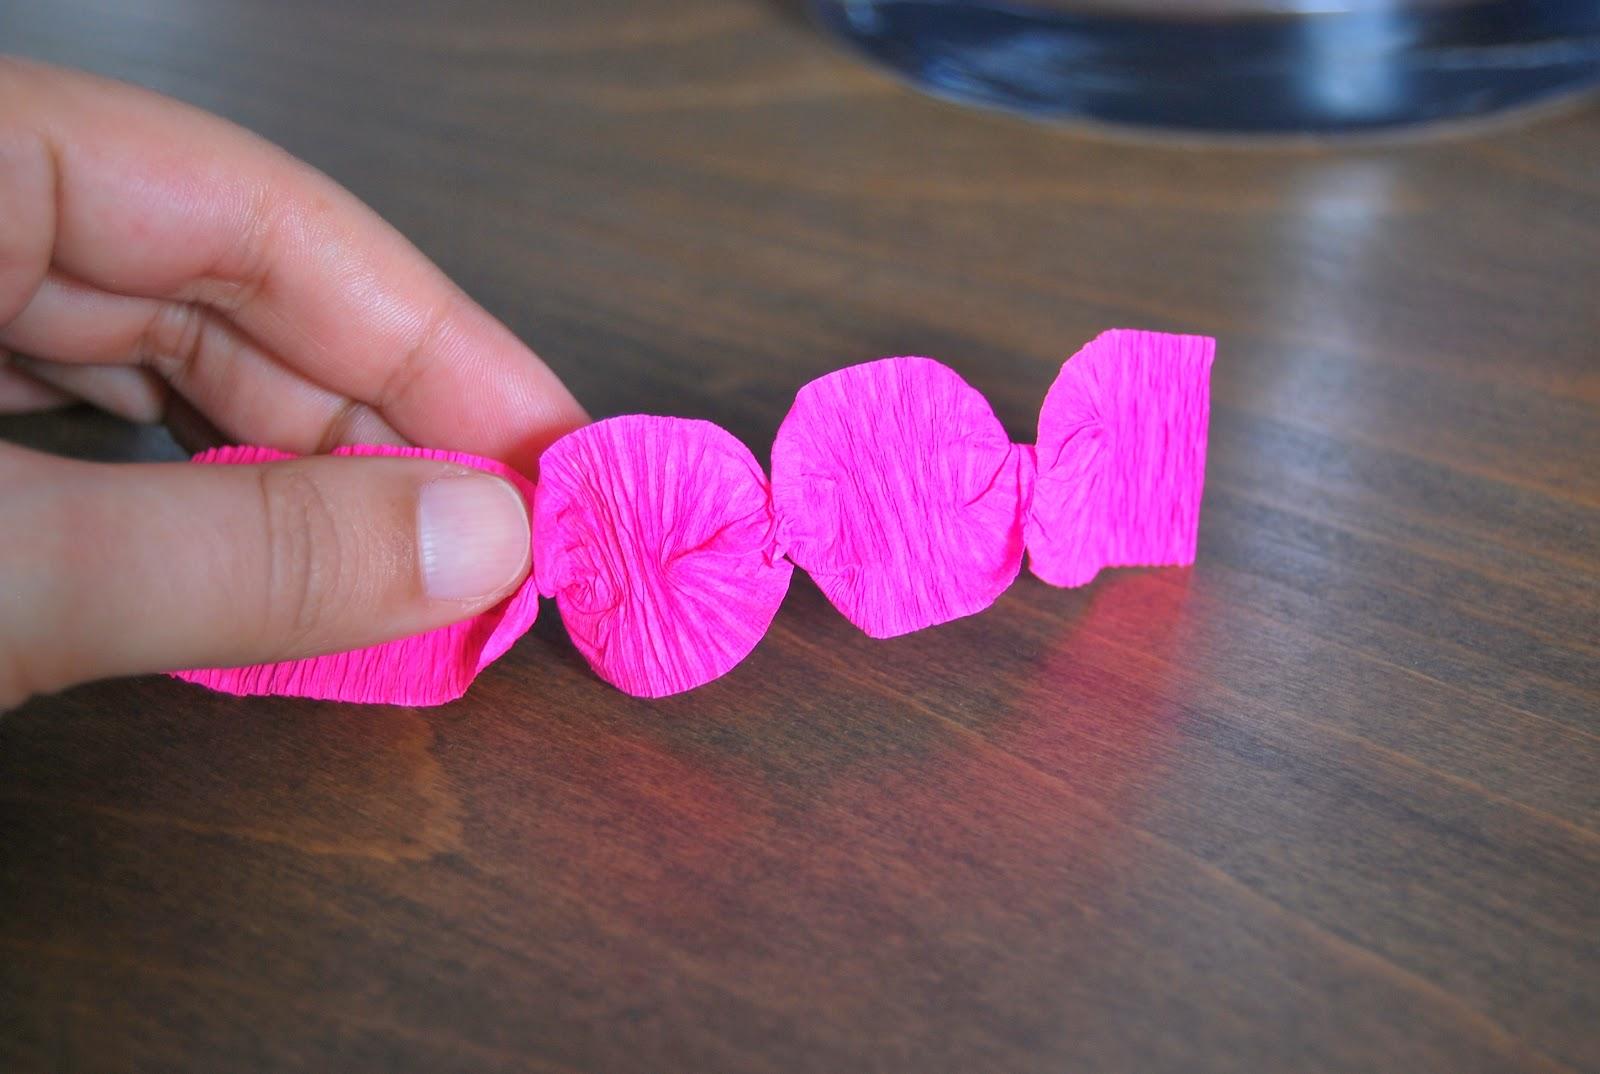 Le grand bazaar guirlandes de ronds en papier cr pon tuto dedans - Tuto fleur en papier crepon ...